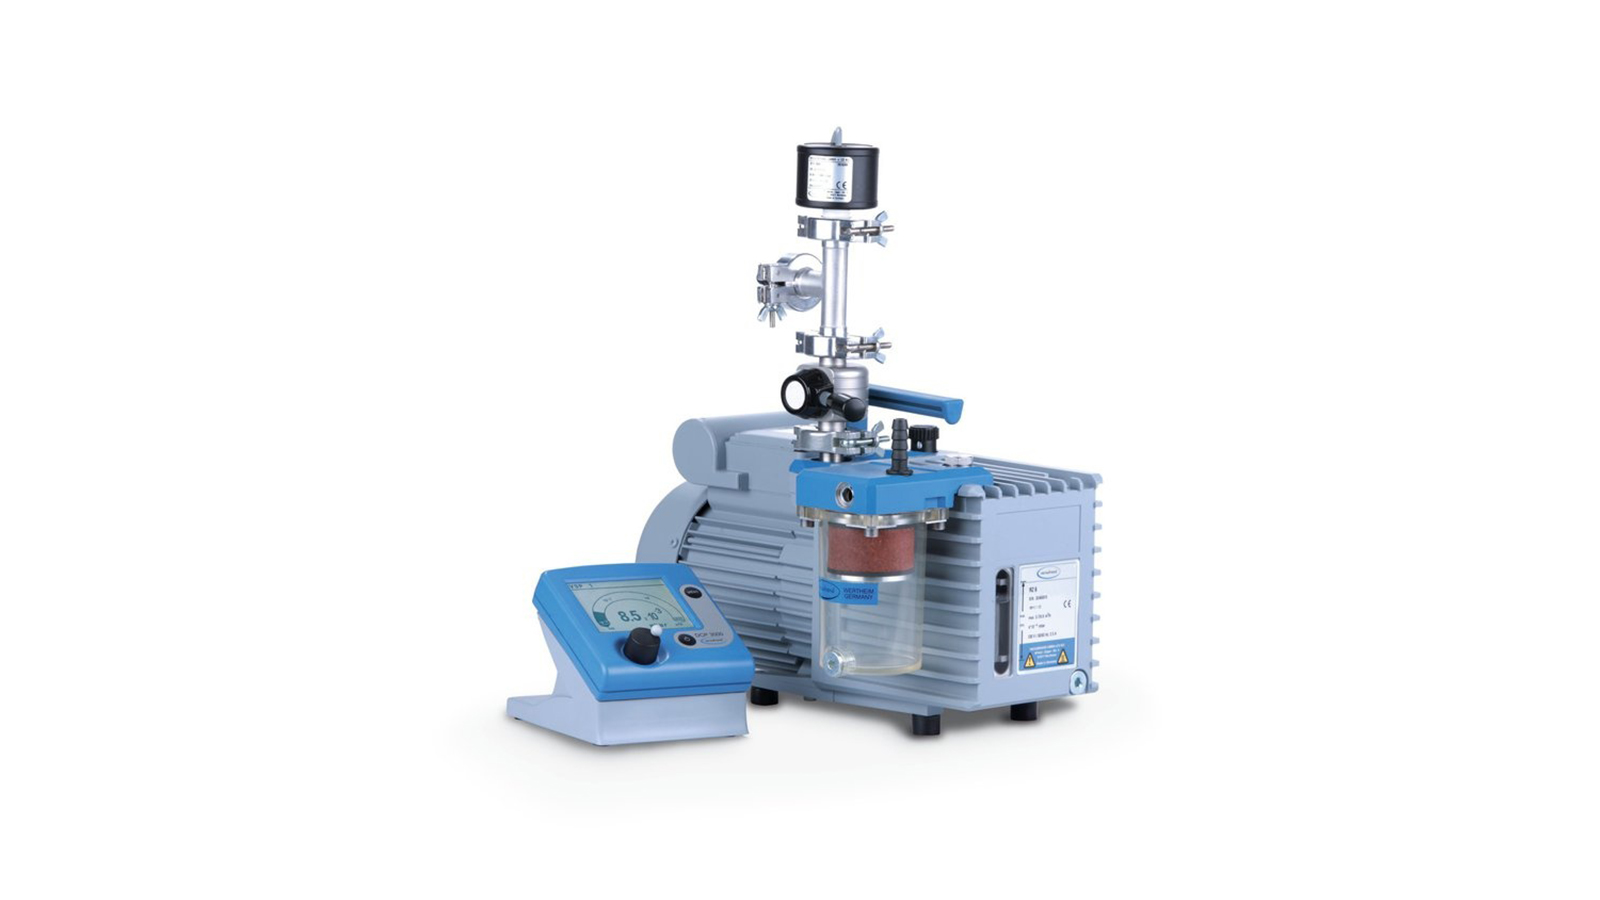 Vacuubrand Rotary Rz 6 + Fo + Vs 16 + Set Dcp + Vsp 3000 || Merlab Laboratuvar Ekipmanları